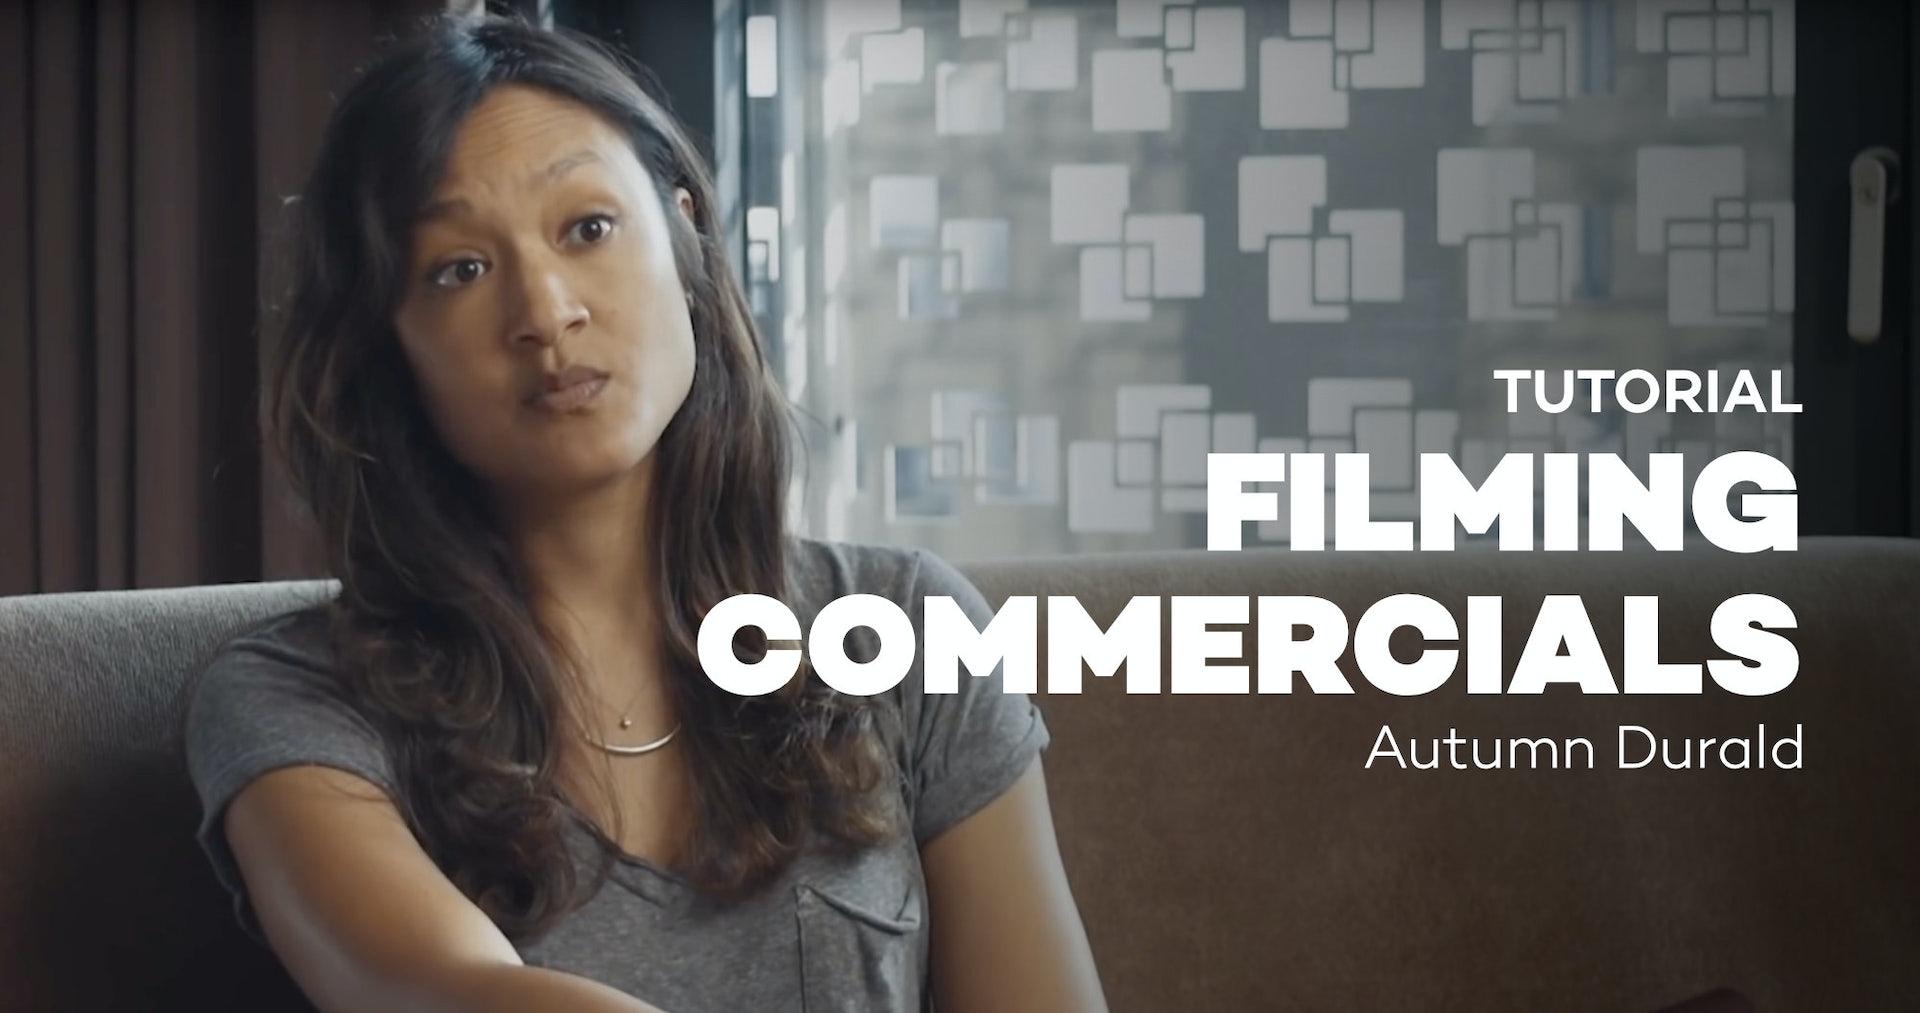 Tutorial: Filming Commercials - Autumn Durald